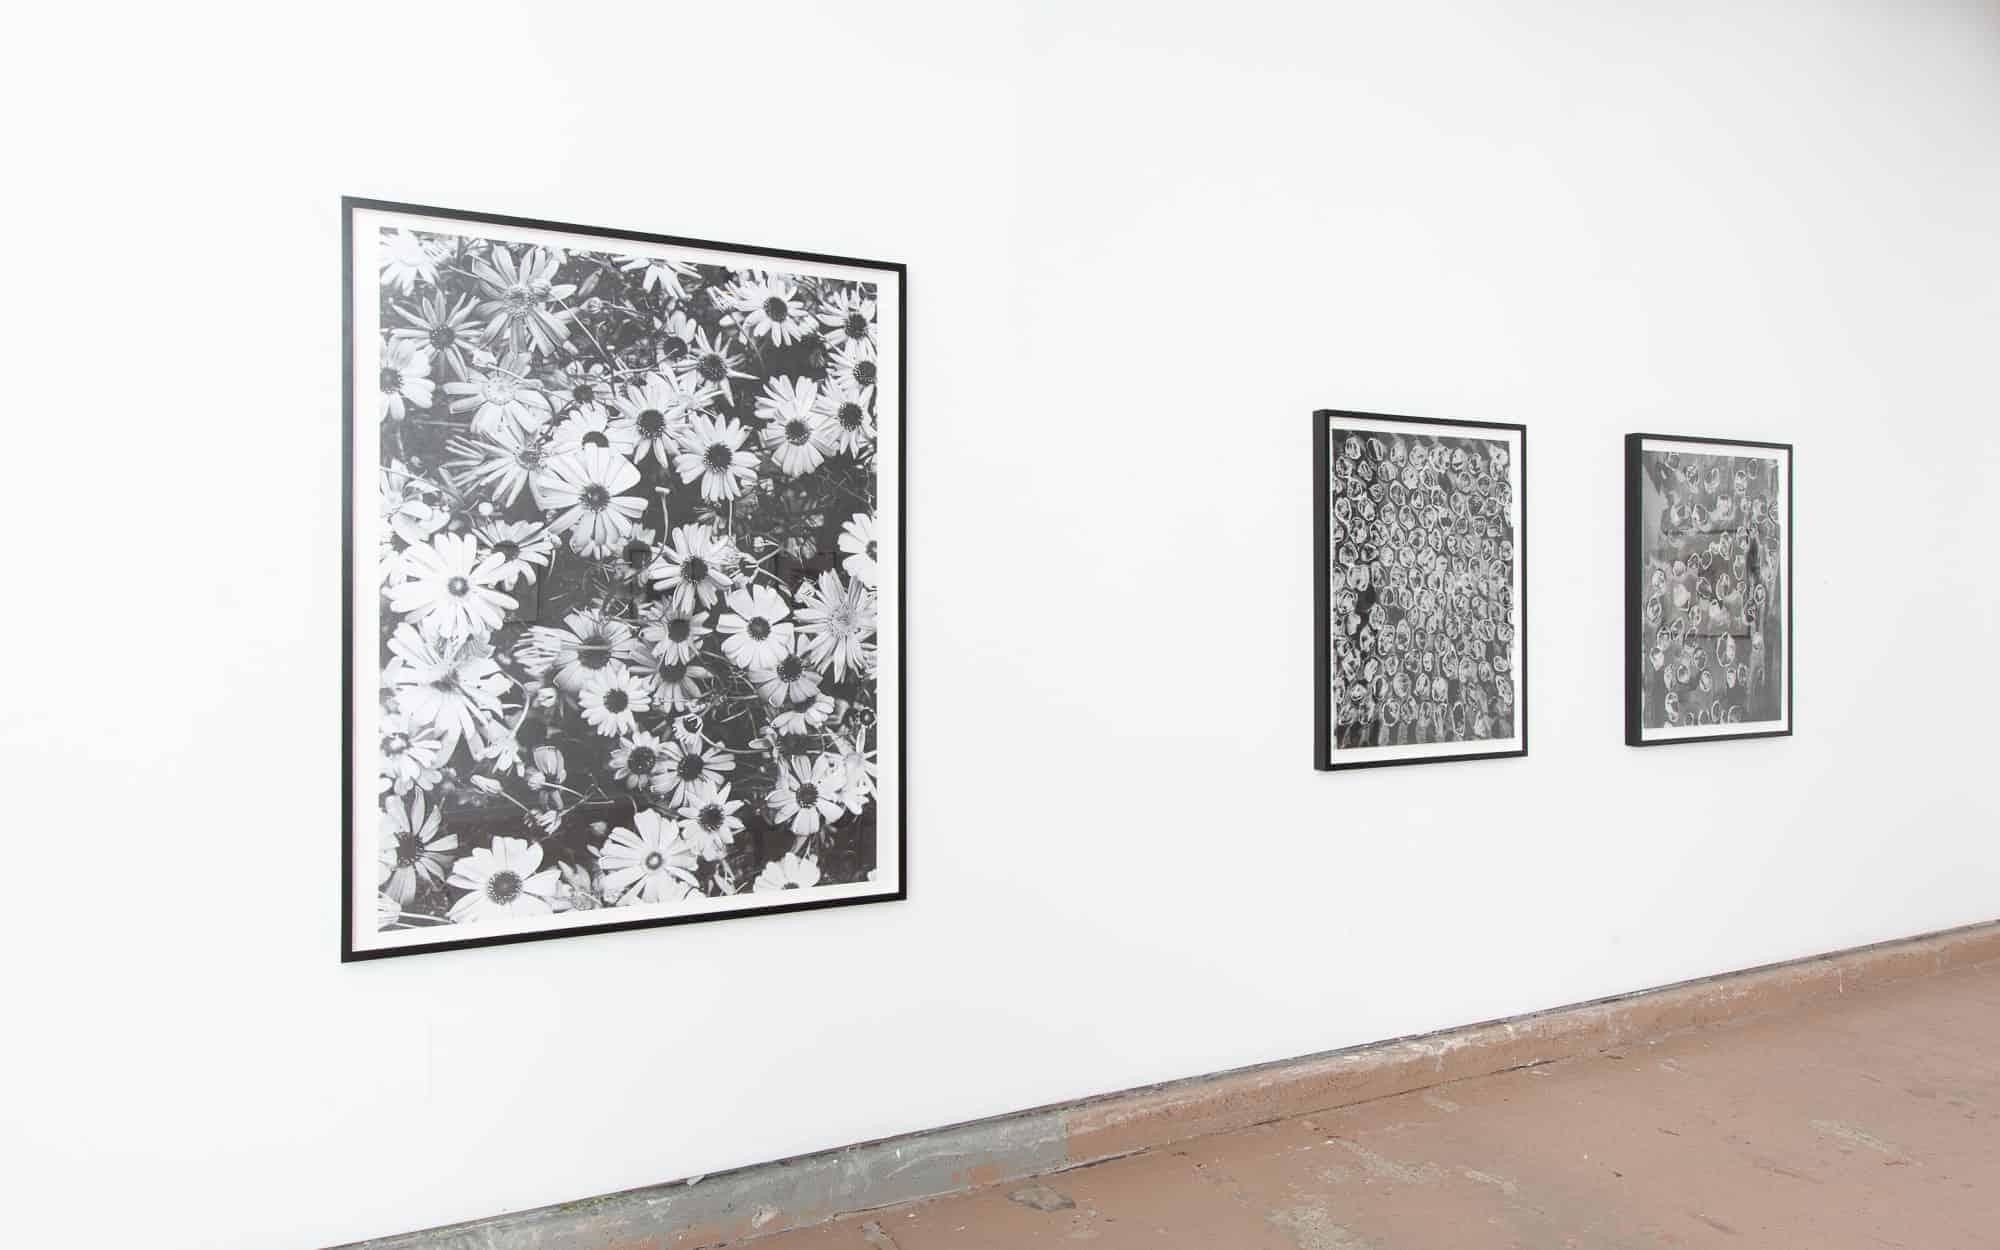 Sondra Meszaros's Camoufleurs black and white flower artwork